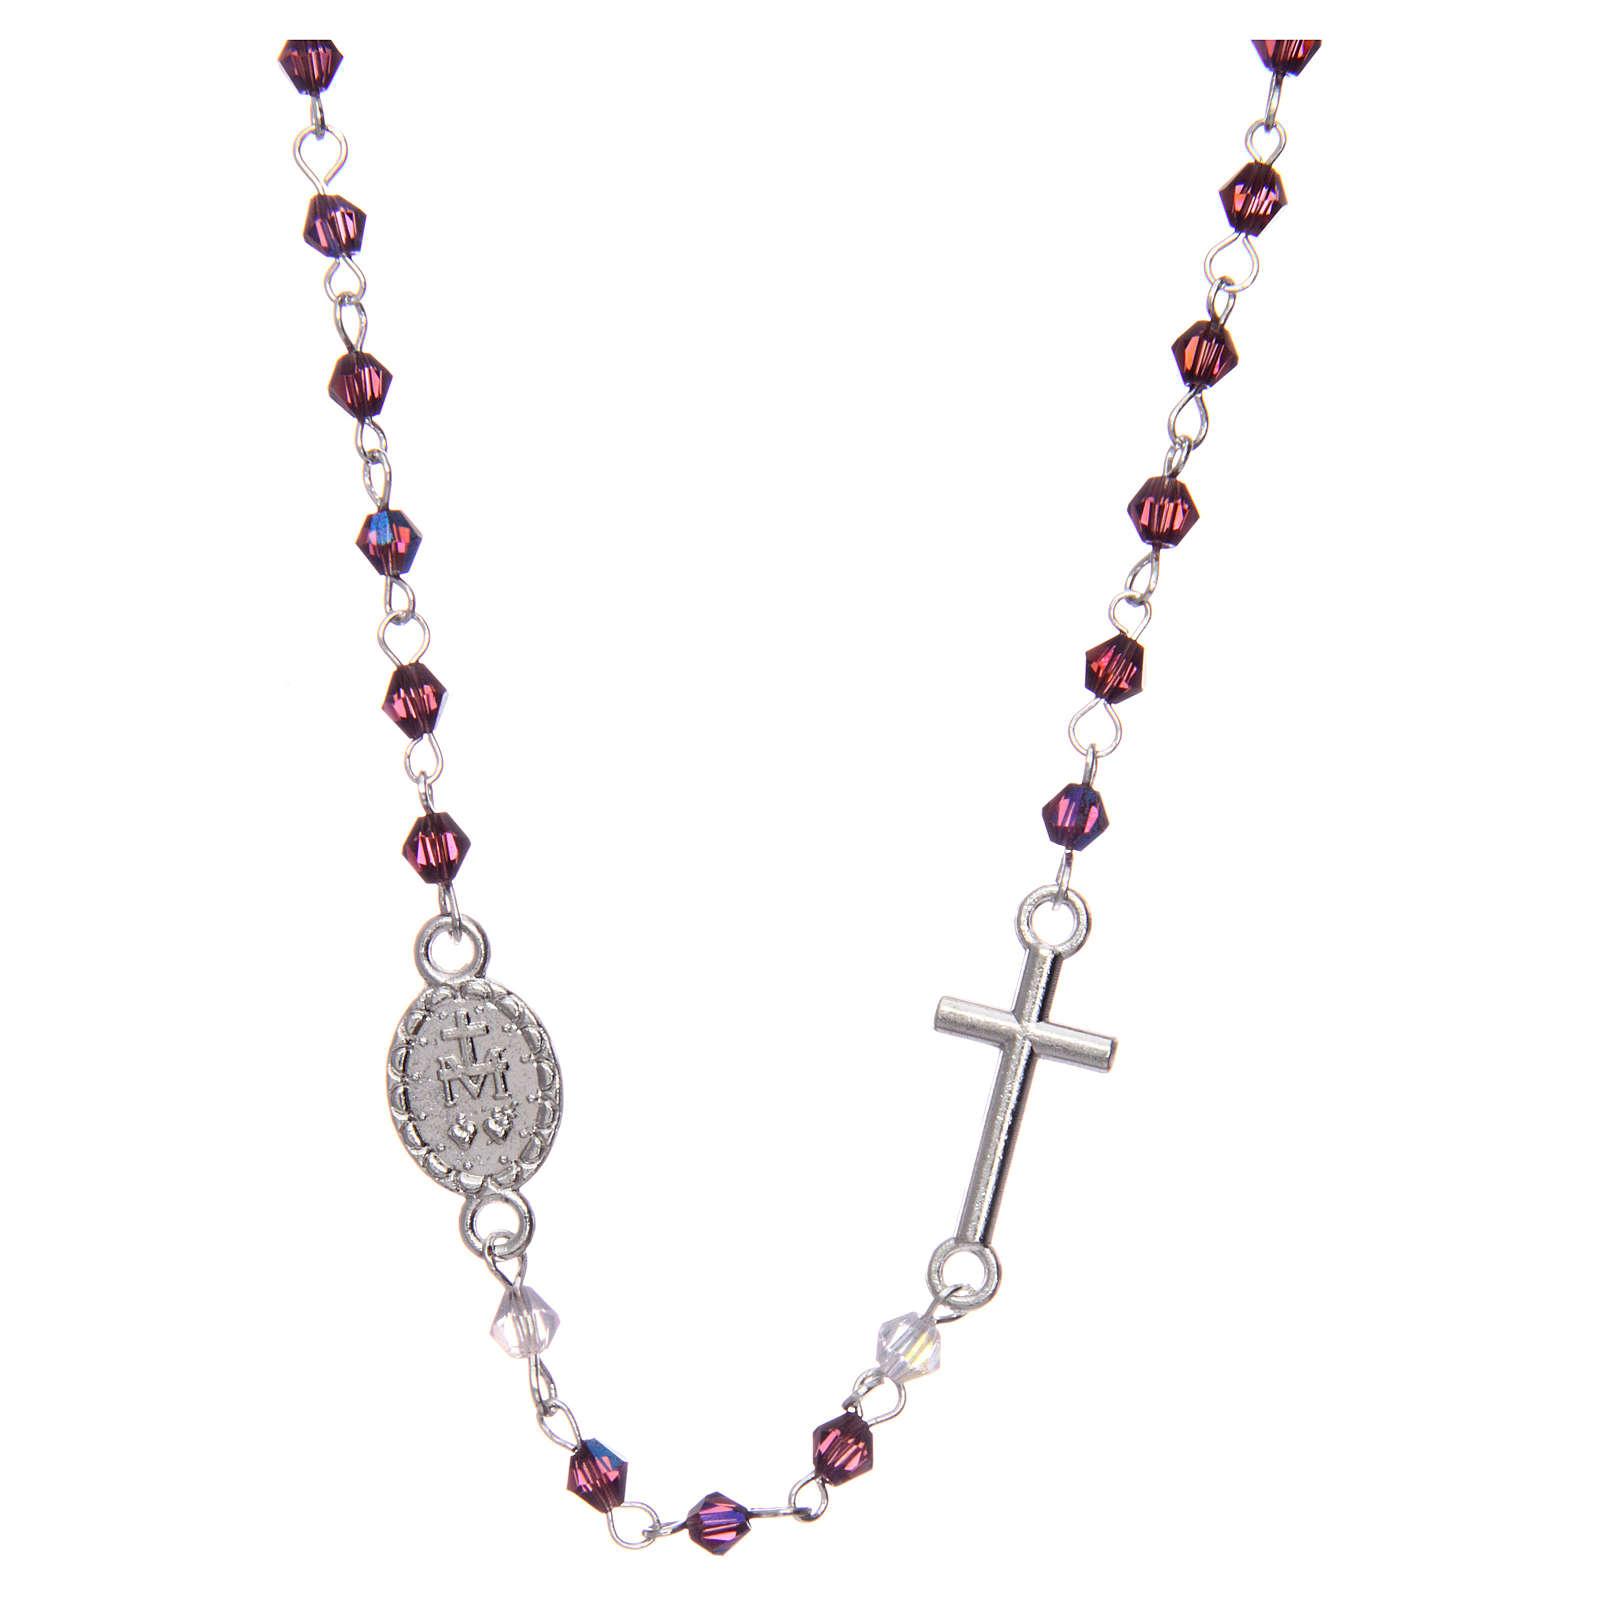 Rosario collar medio cristal ovalado 3 mm violeta iridiscente 4